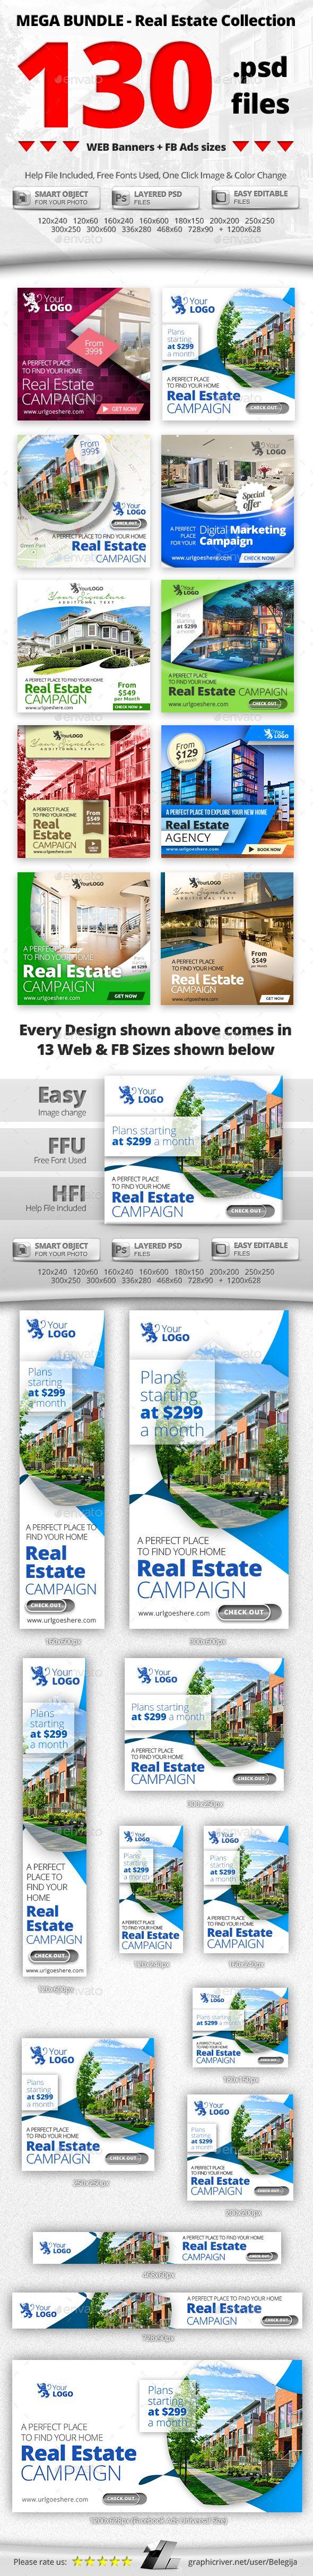 10 in 1 Real Estate Web & FB Banners - MEGA Bundle 3 - Banners & Ads Web Elements Download here : https://graphicriver.net/item/10-in-1-real-estate-web-fb-banners-mega-bundle-3/19578686?s_rank=85&ref=Al-fatih